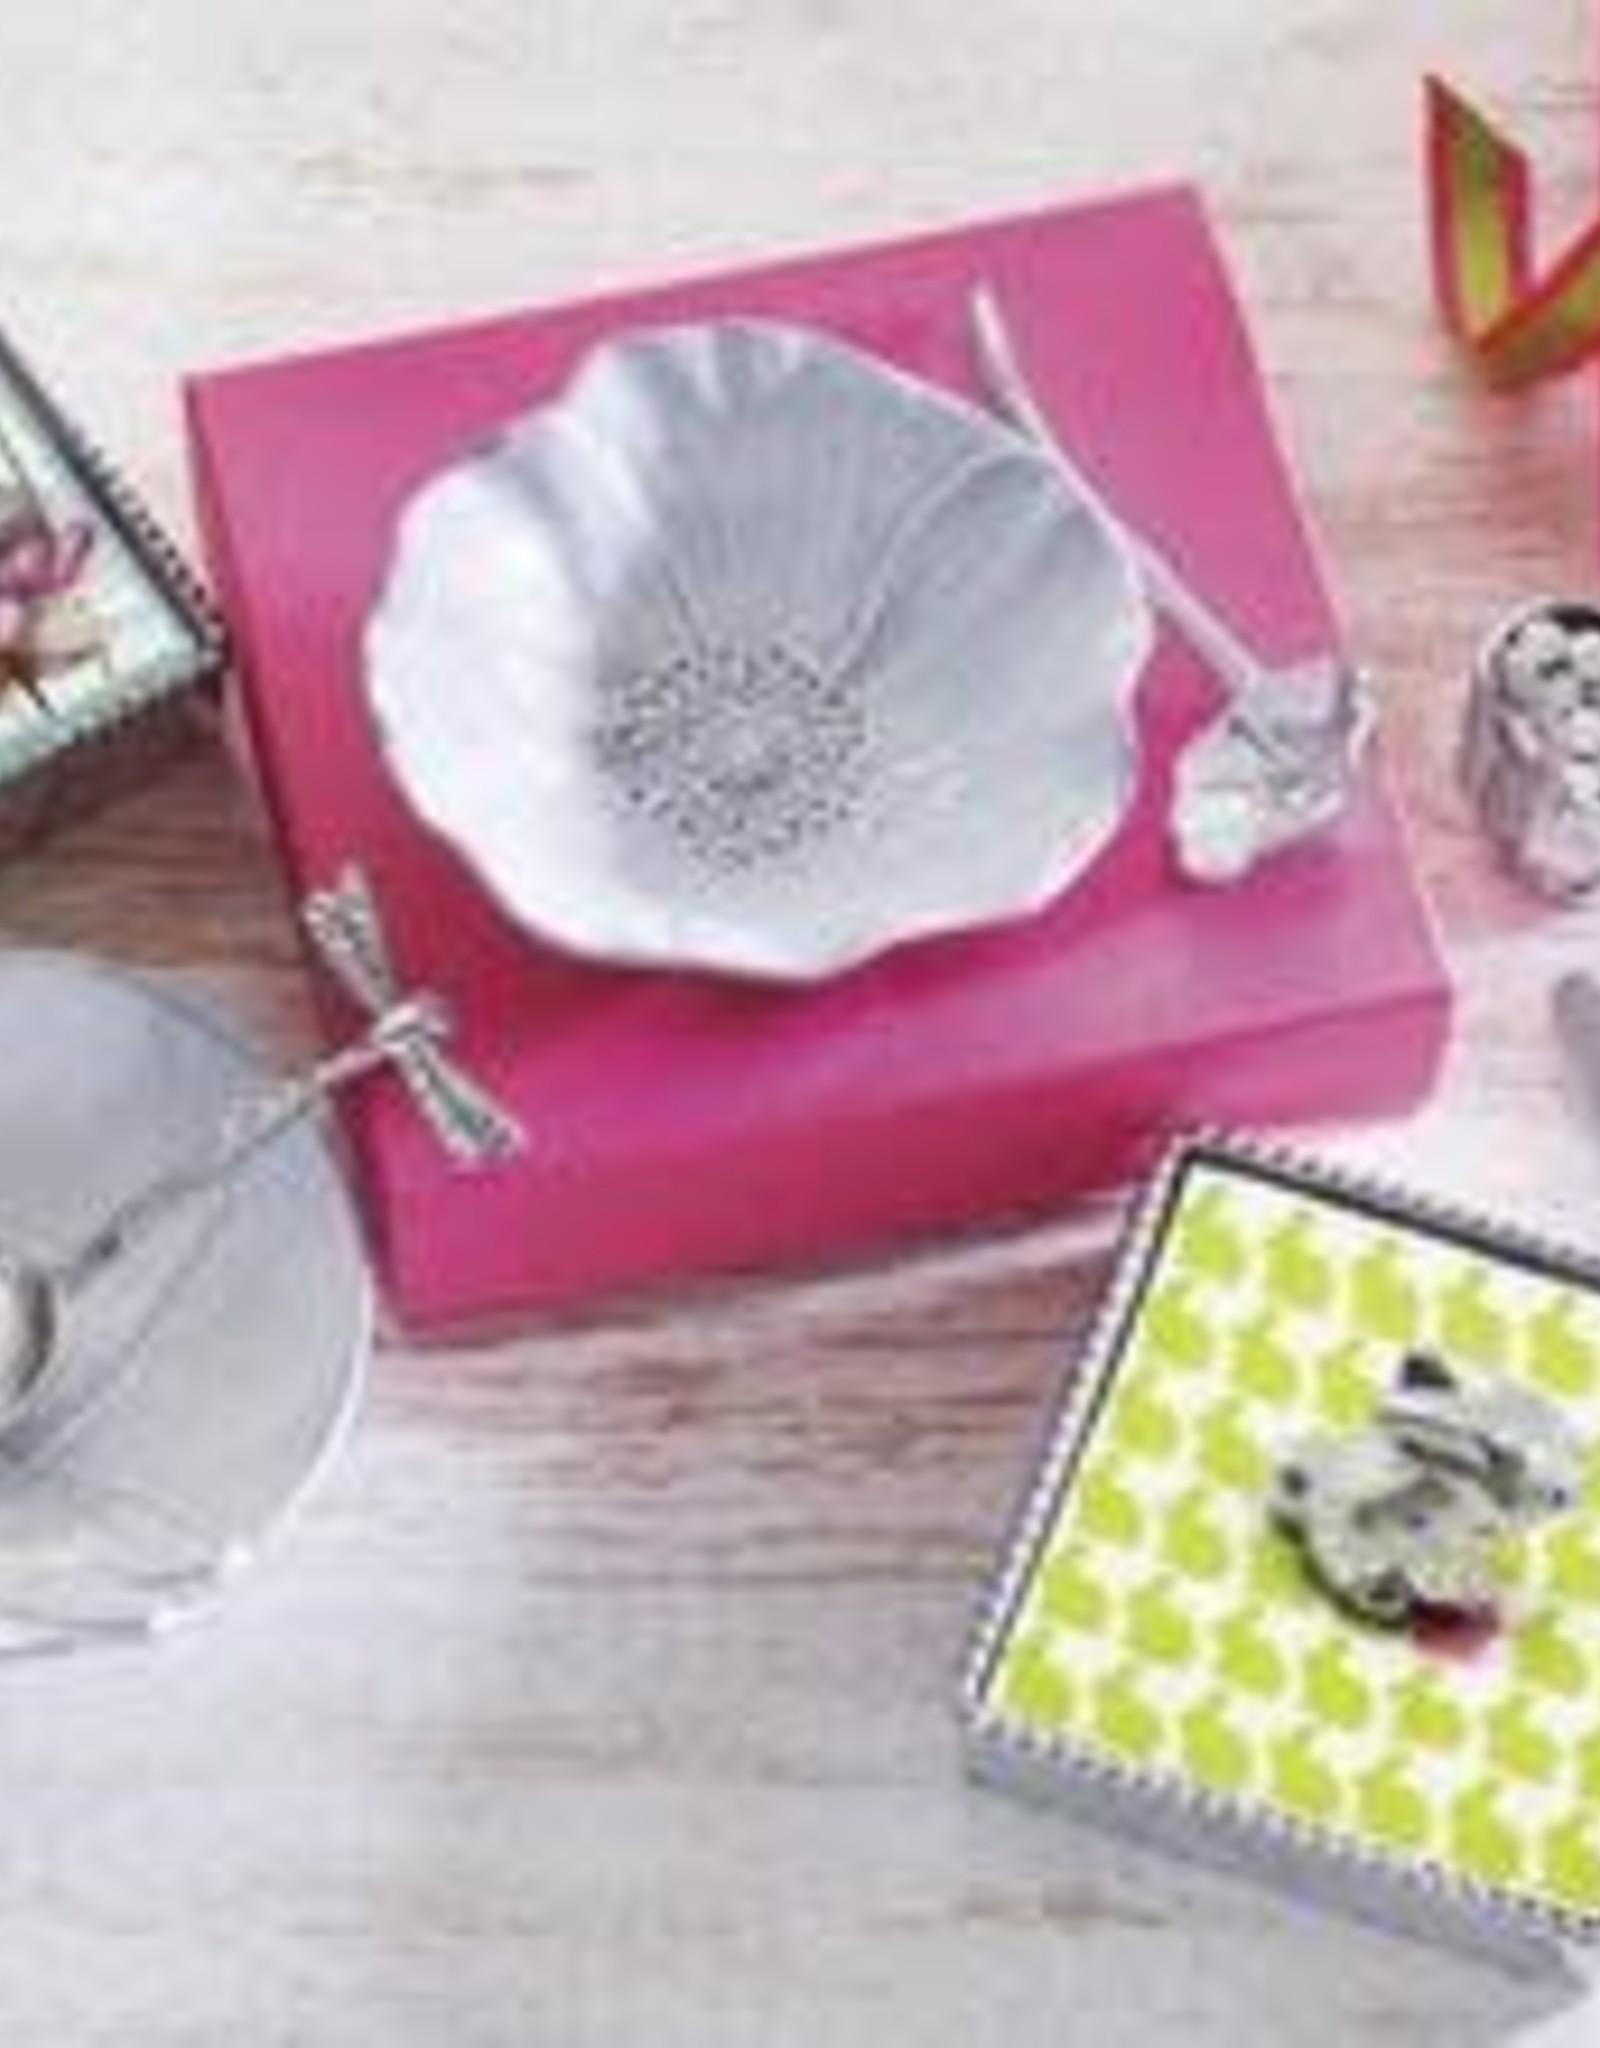 Mariposa Poppy Ceramic Canape  Plate with Poppy Spoon